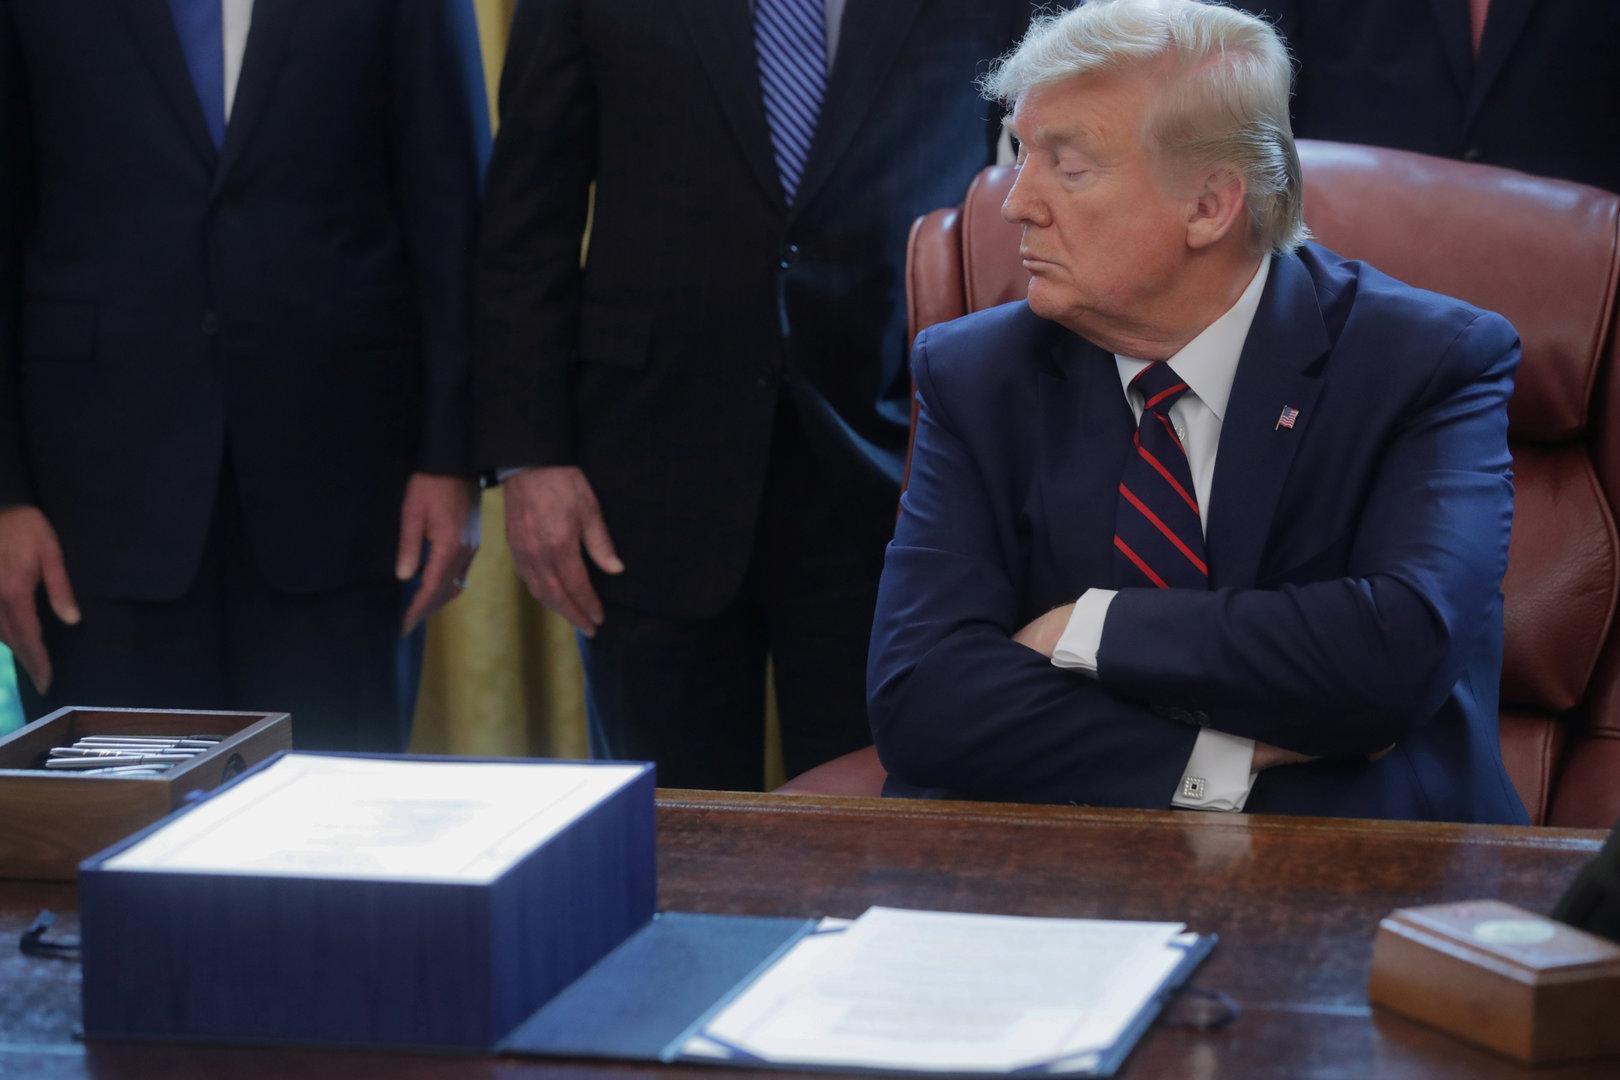 Amtsenthebungsverfahren gegen Trump startet im Februar